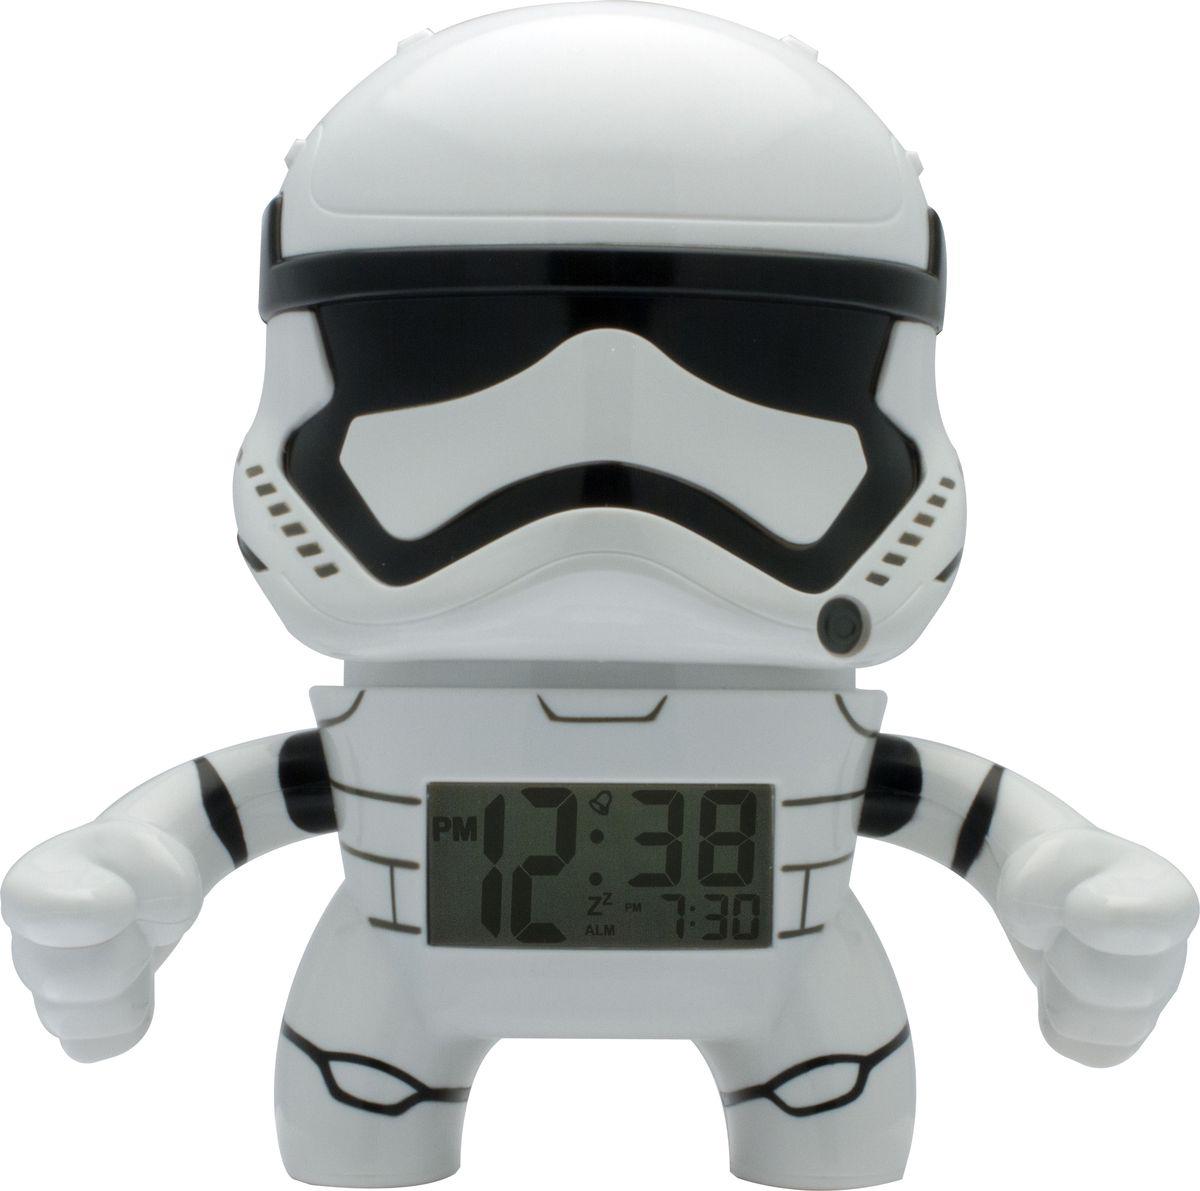 Star Wars BulbBotz Будильник детский Stormtrooper все цены